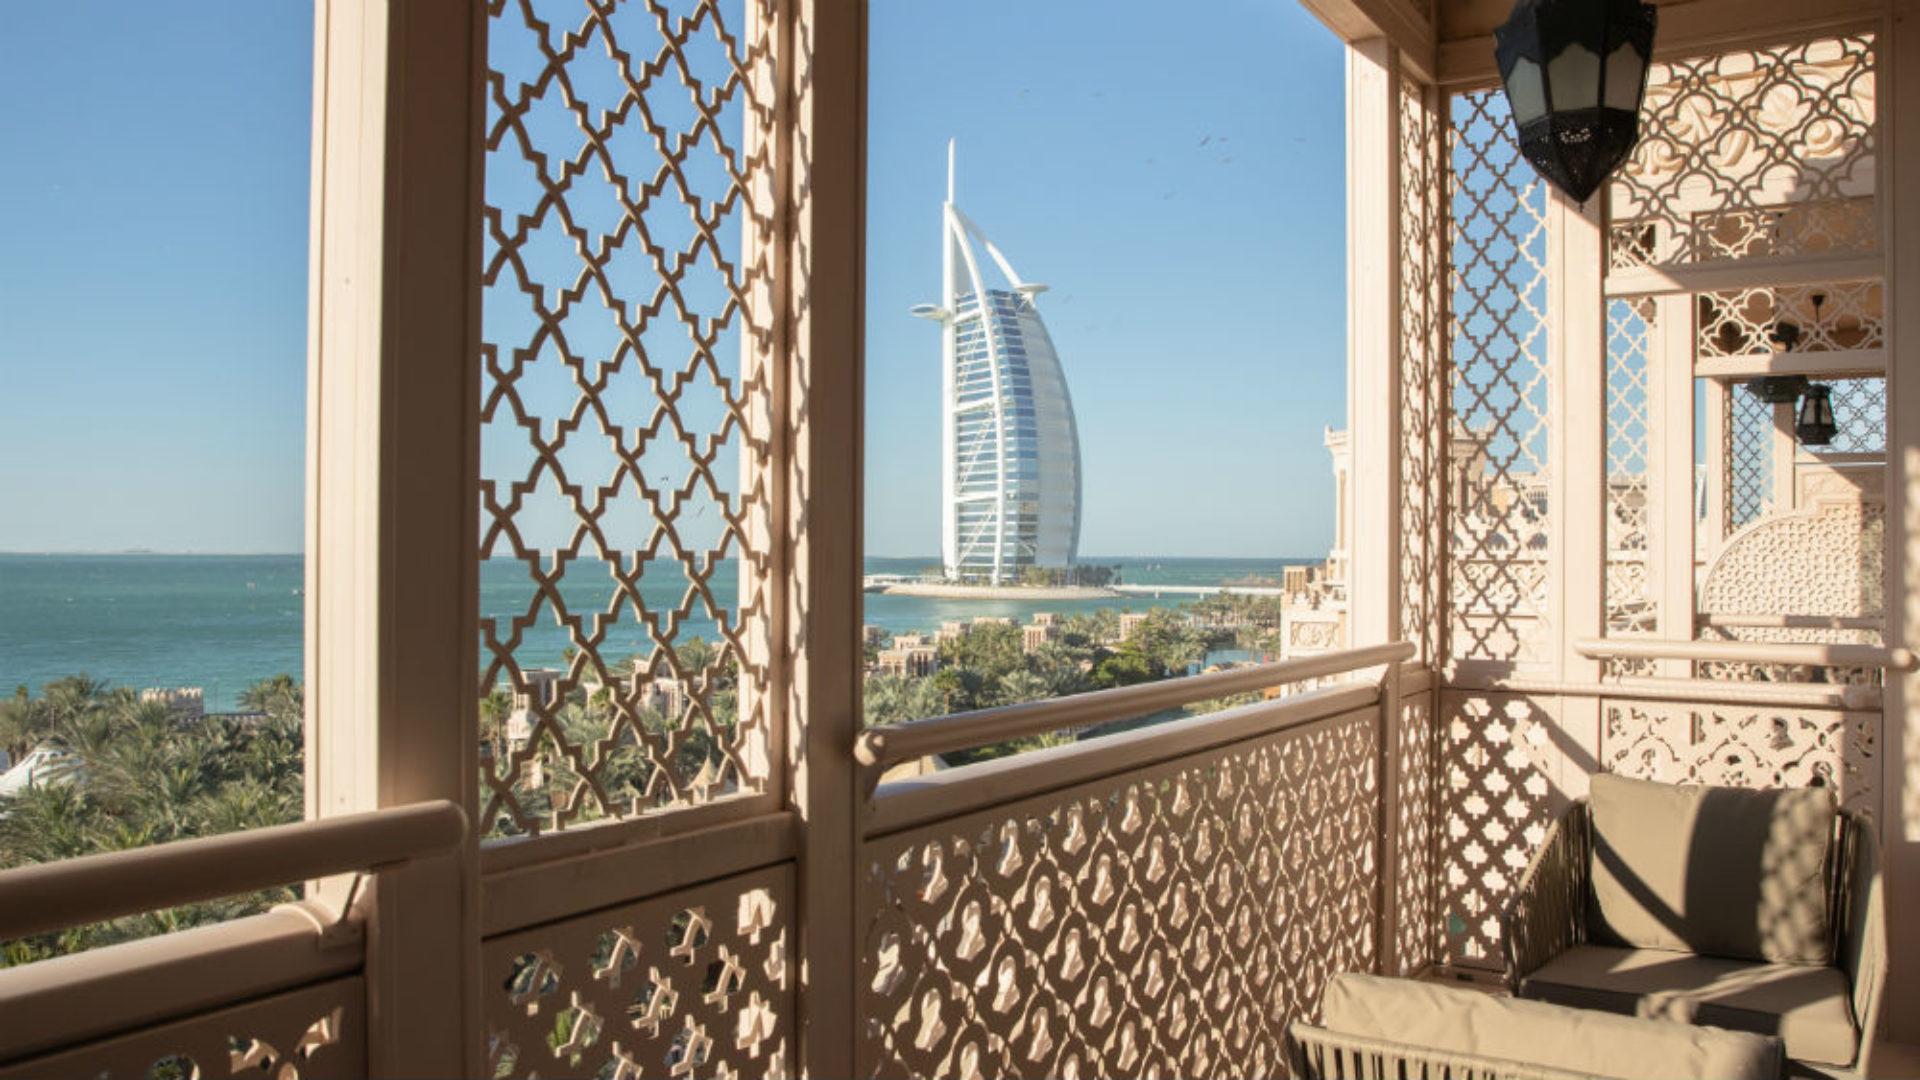 Presidential Suite Balcony at the Jumeirah Al Qasr